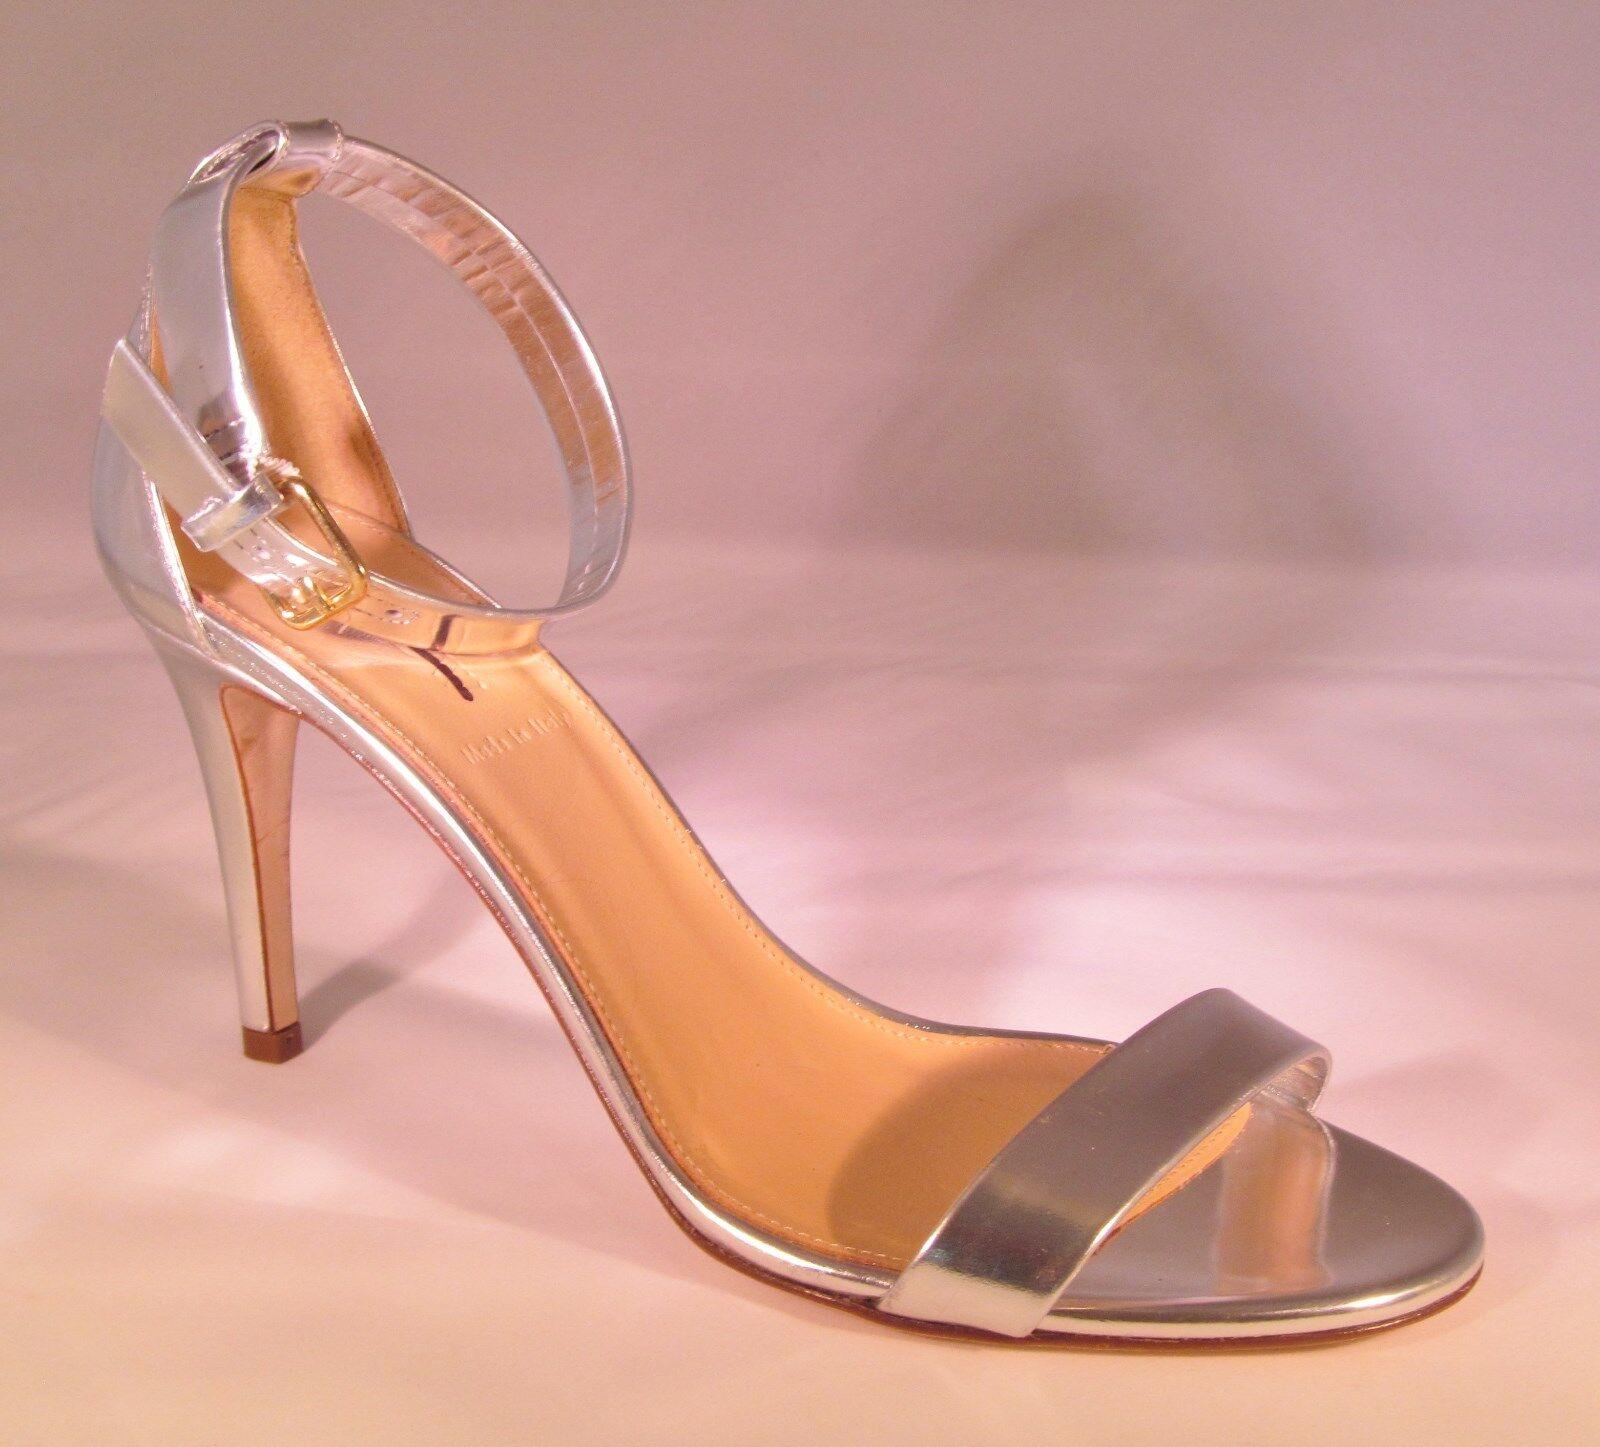 J Crew Mirror Metallic High Heel Sandale 6 - Metallic Silver